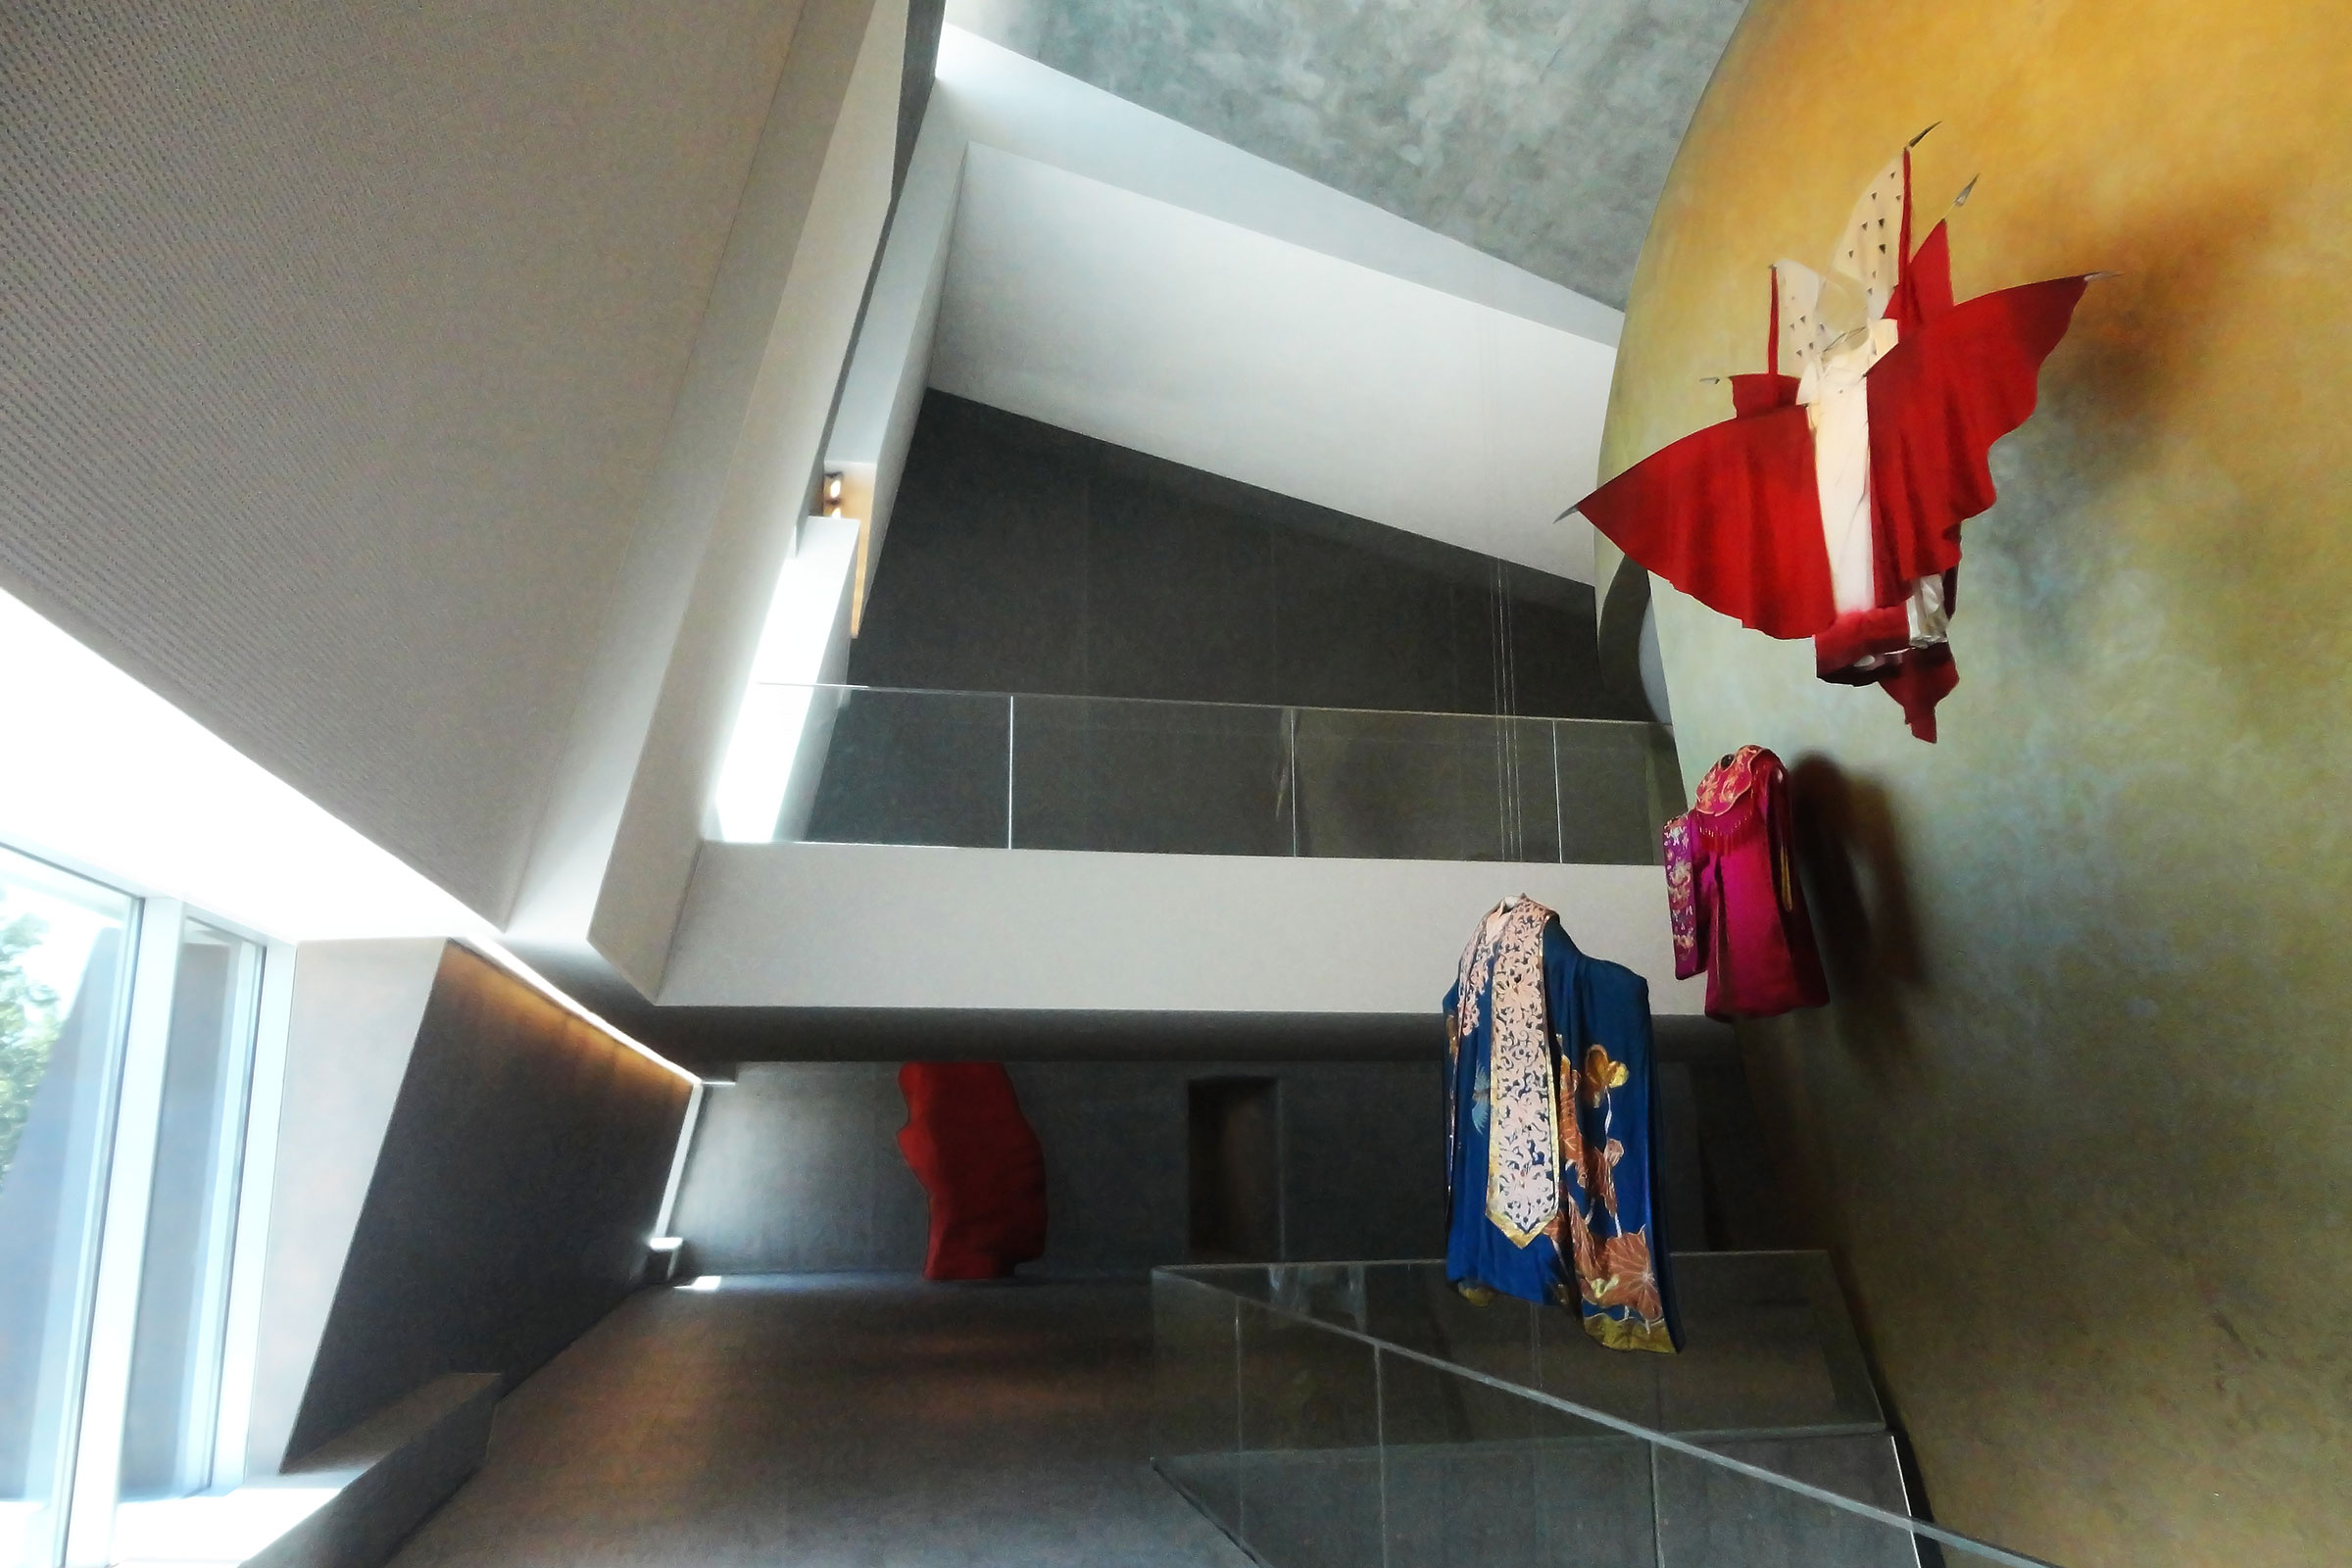 07_teatro-dellopera-firenze_2400x1600